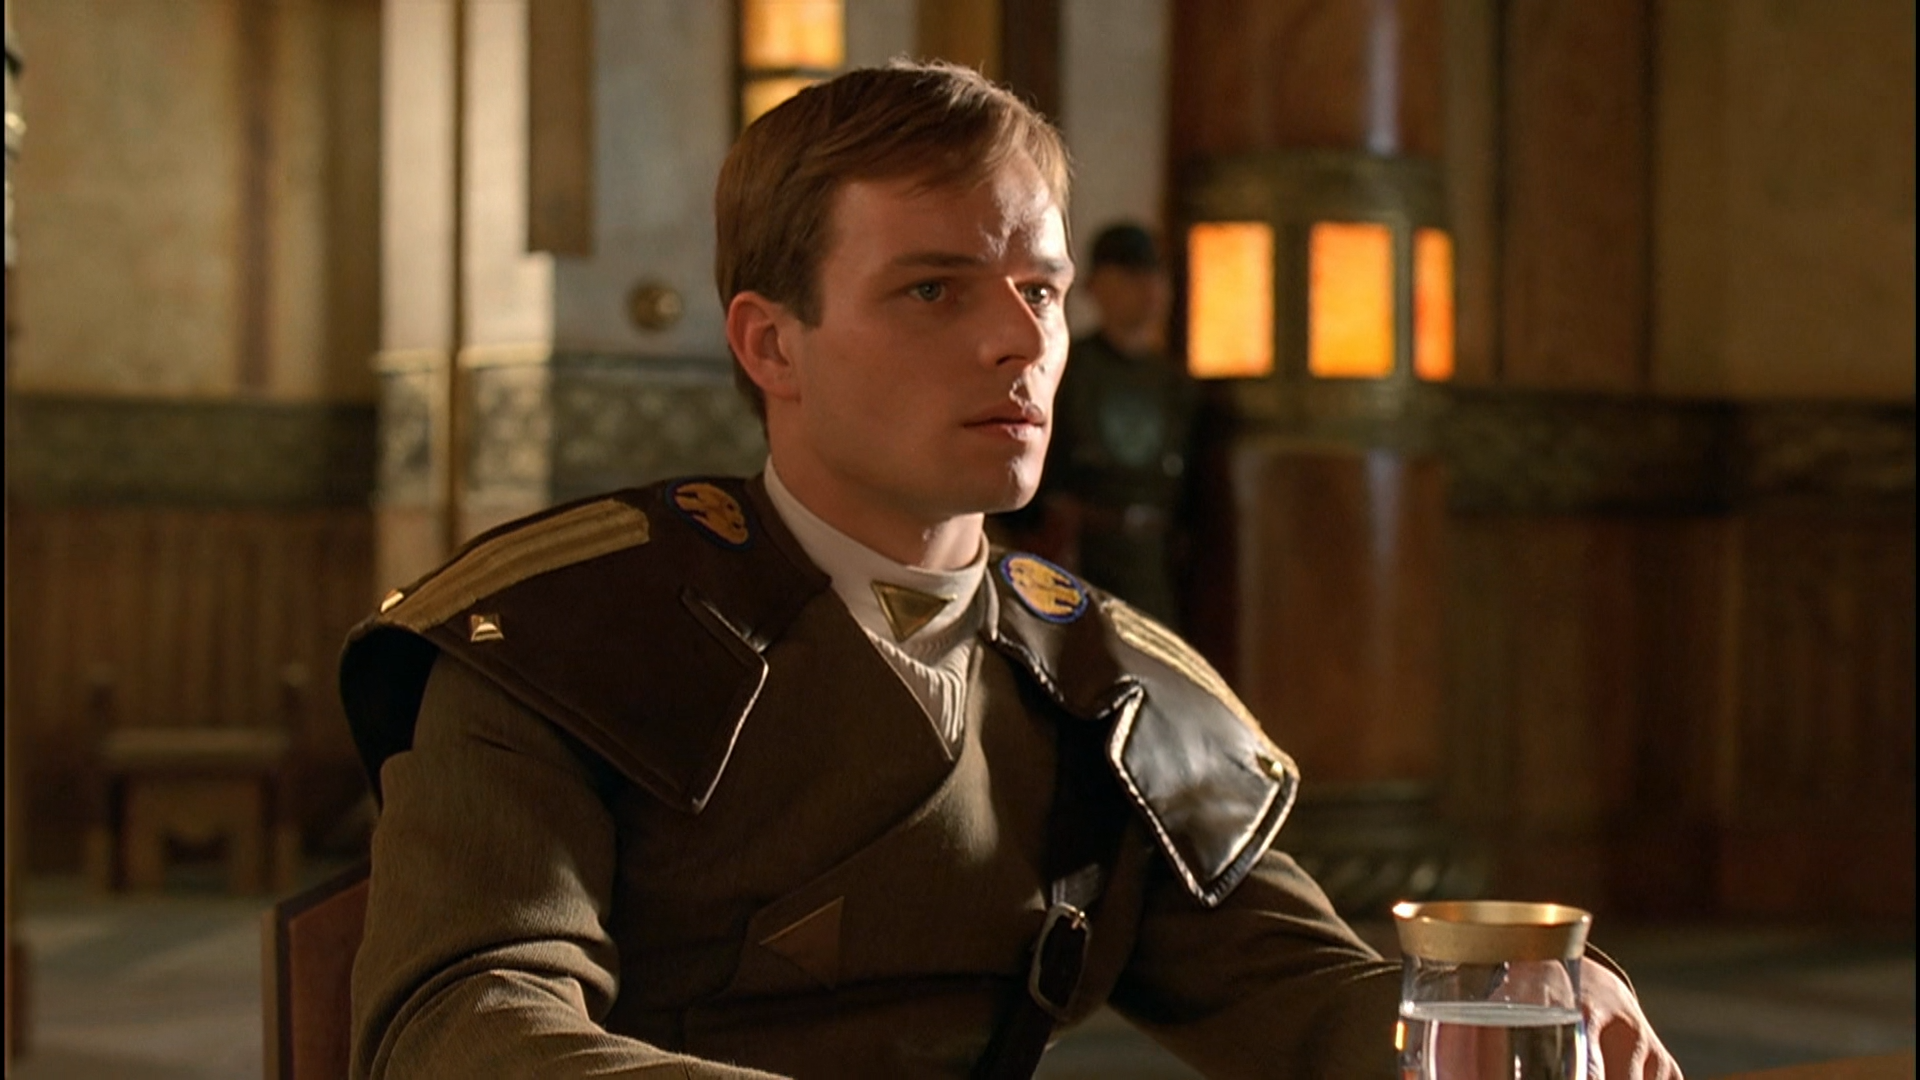 Frank Herbert Dune Alec Newman as Paul Atreides